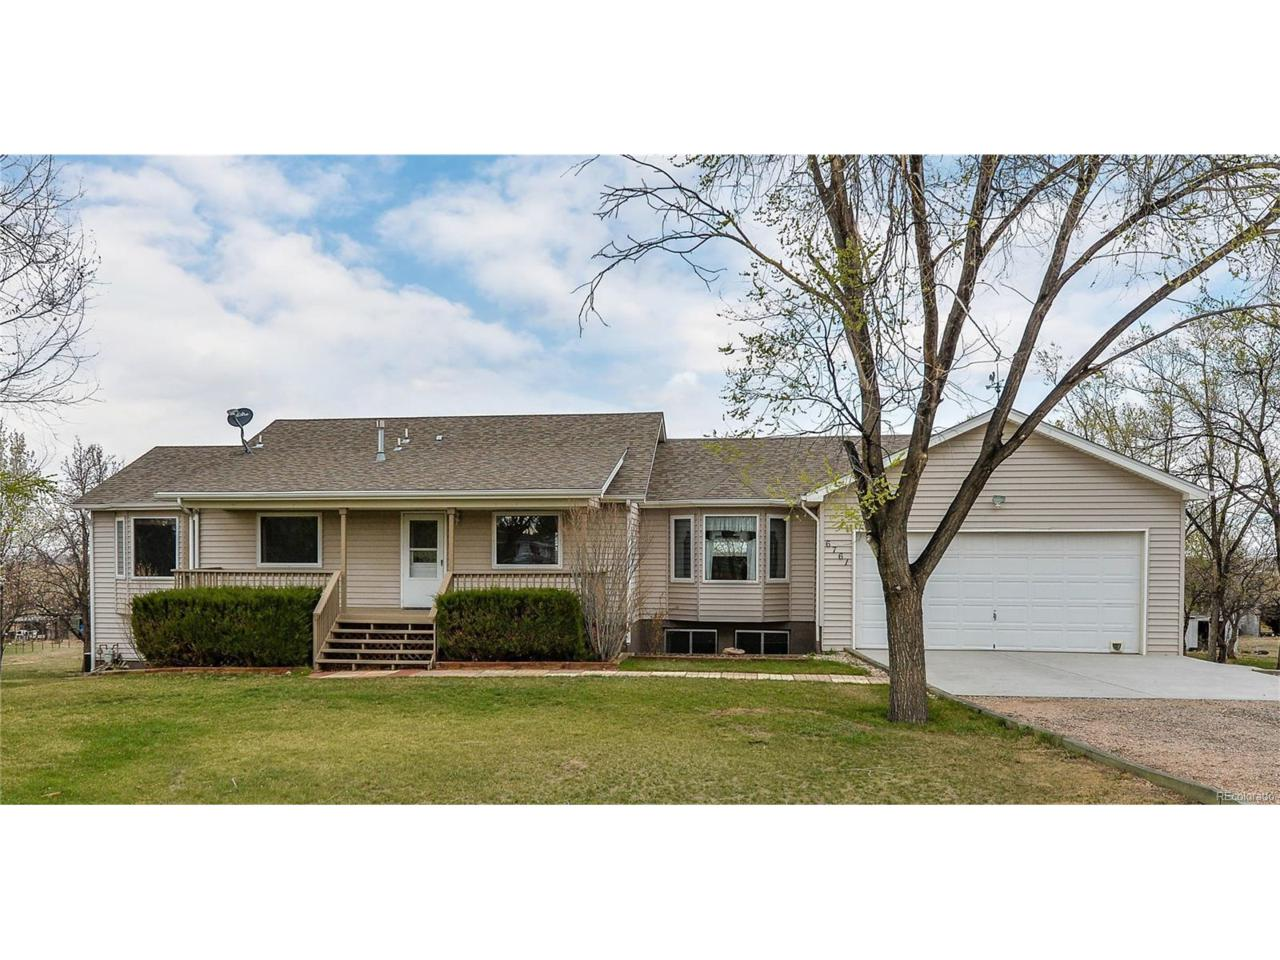 6761 Steven Street, Windsor, CO 80550 (MLS #4415139) :: 8z Real Estate